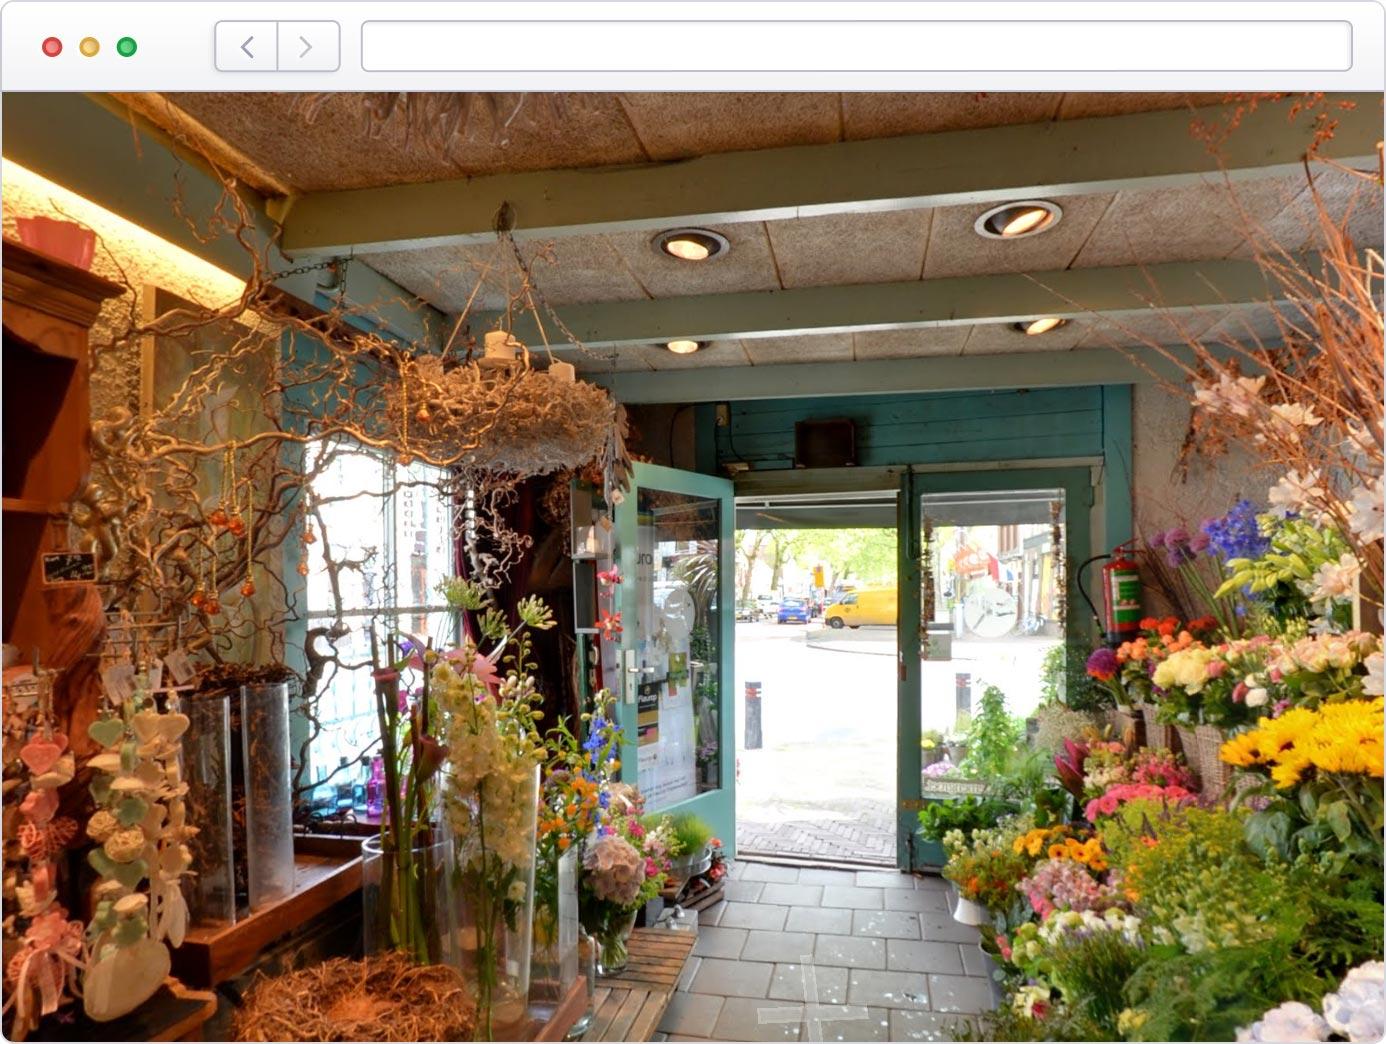 Virtuele tour van winkel op Google